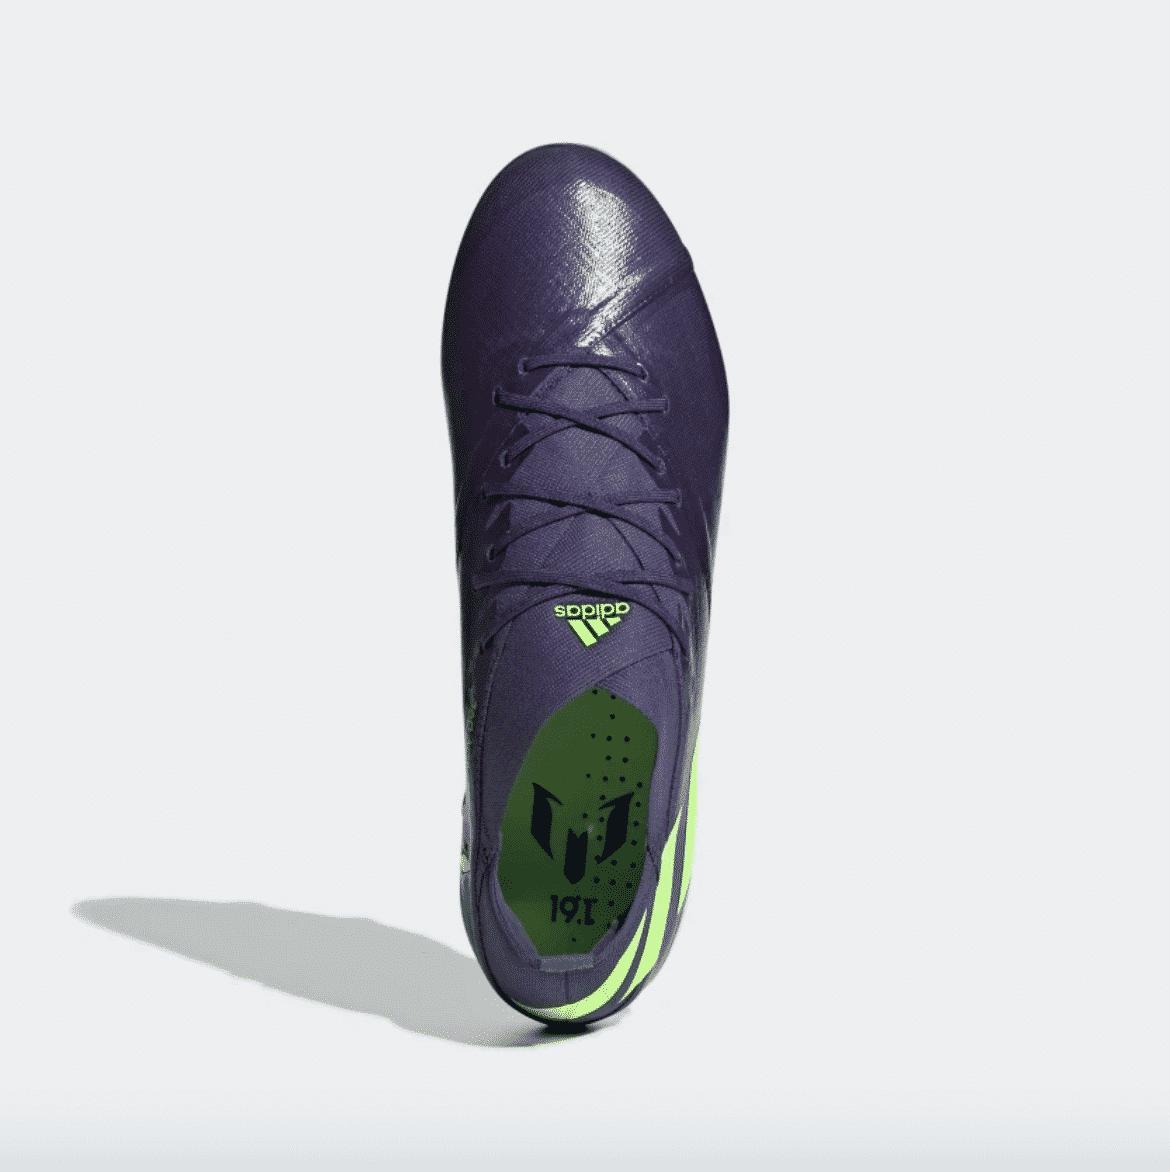 chaussures-adidas-nemeziz-19.1-lionel-messi-ballon-or-2019-3